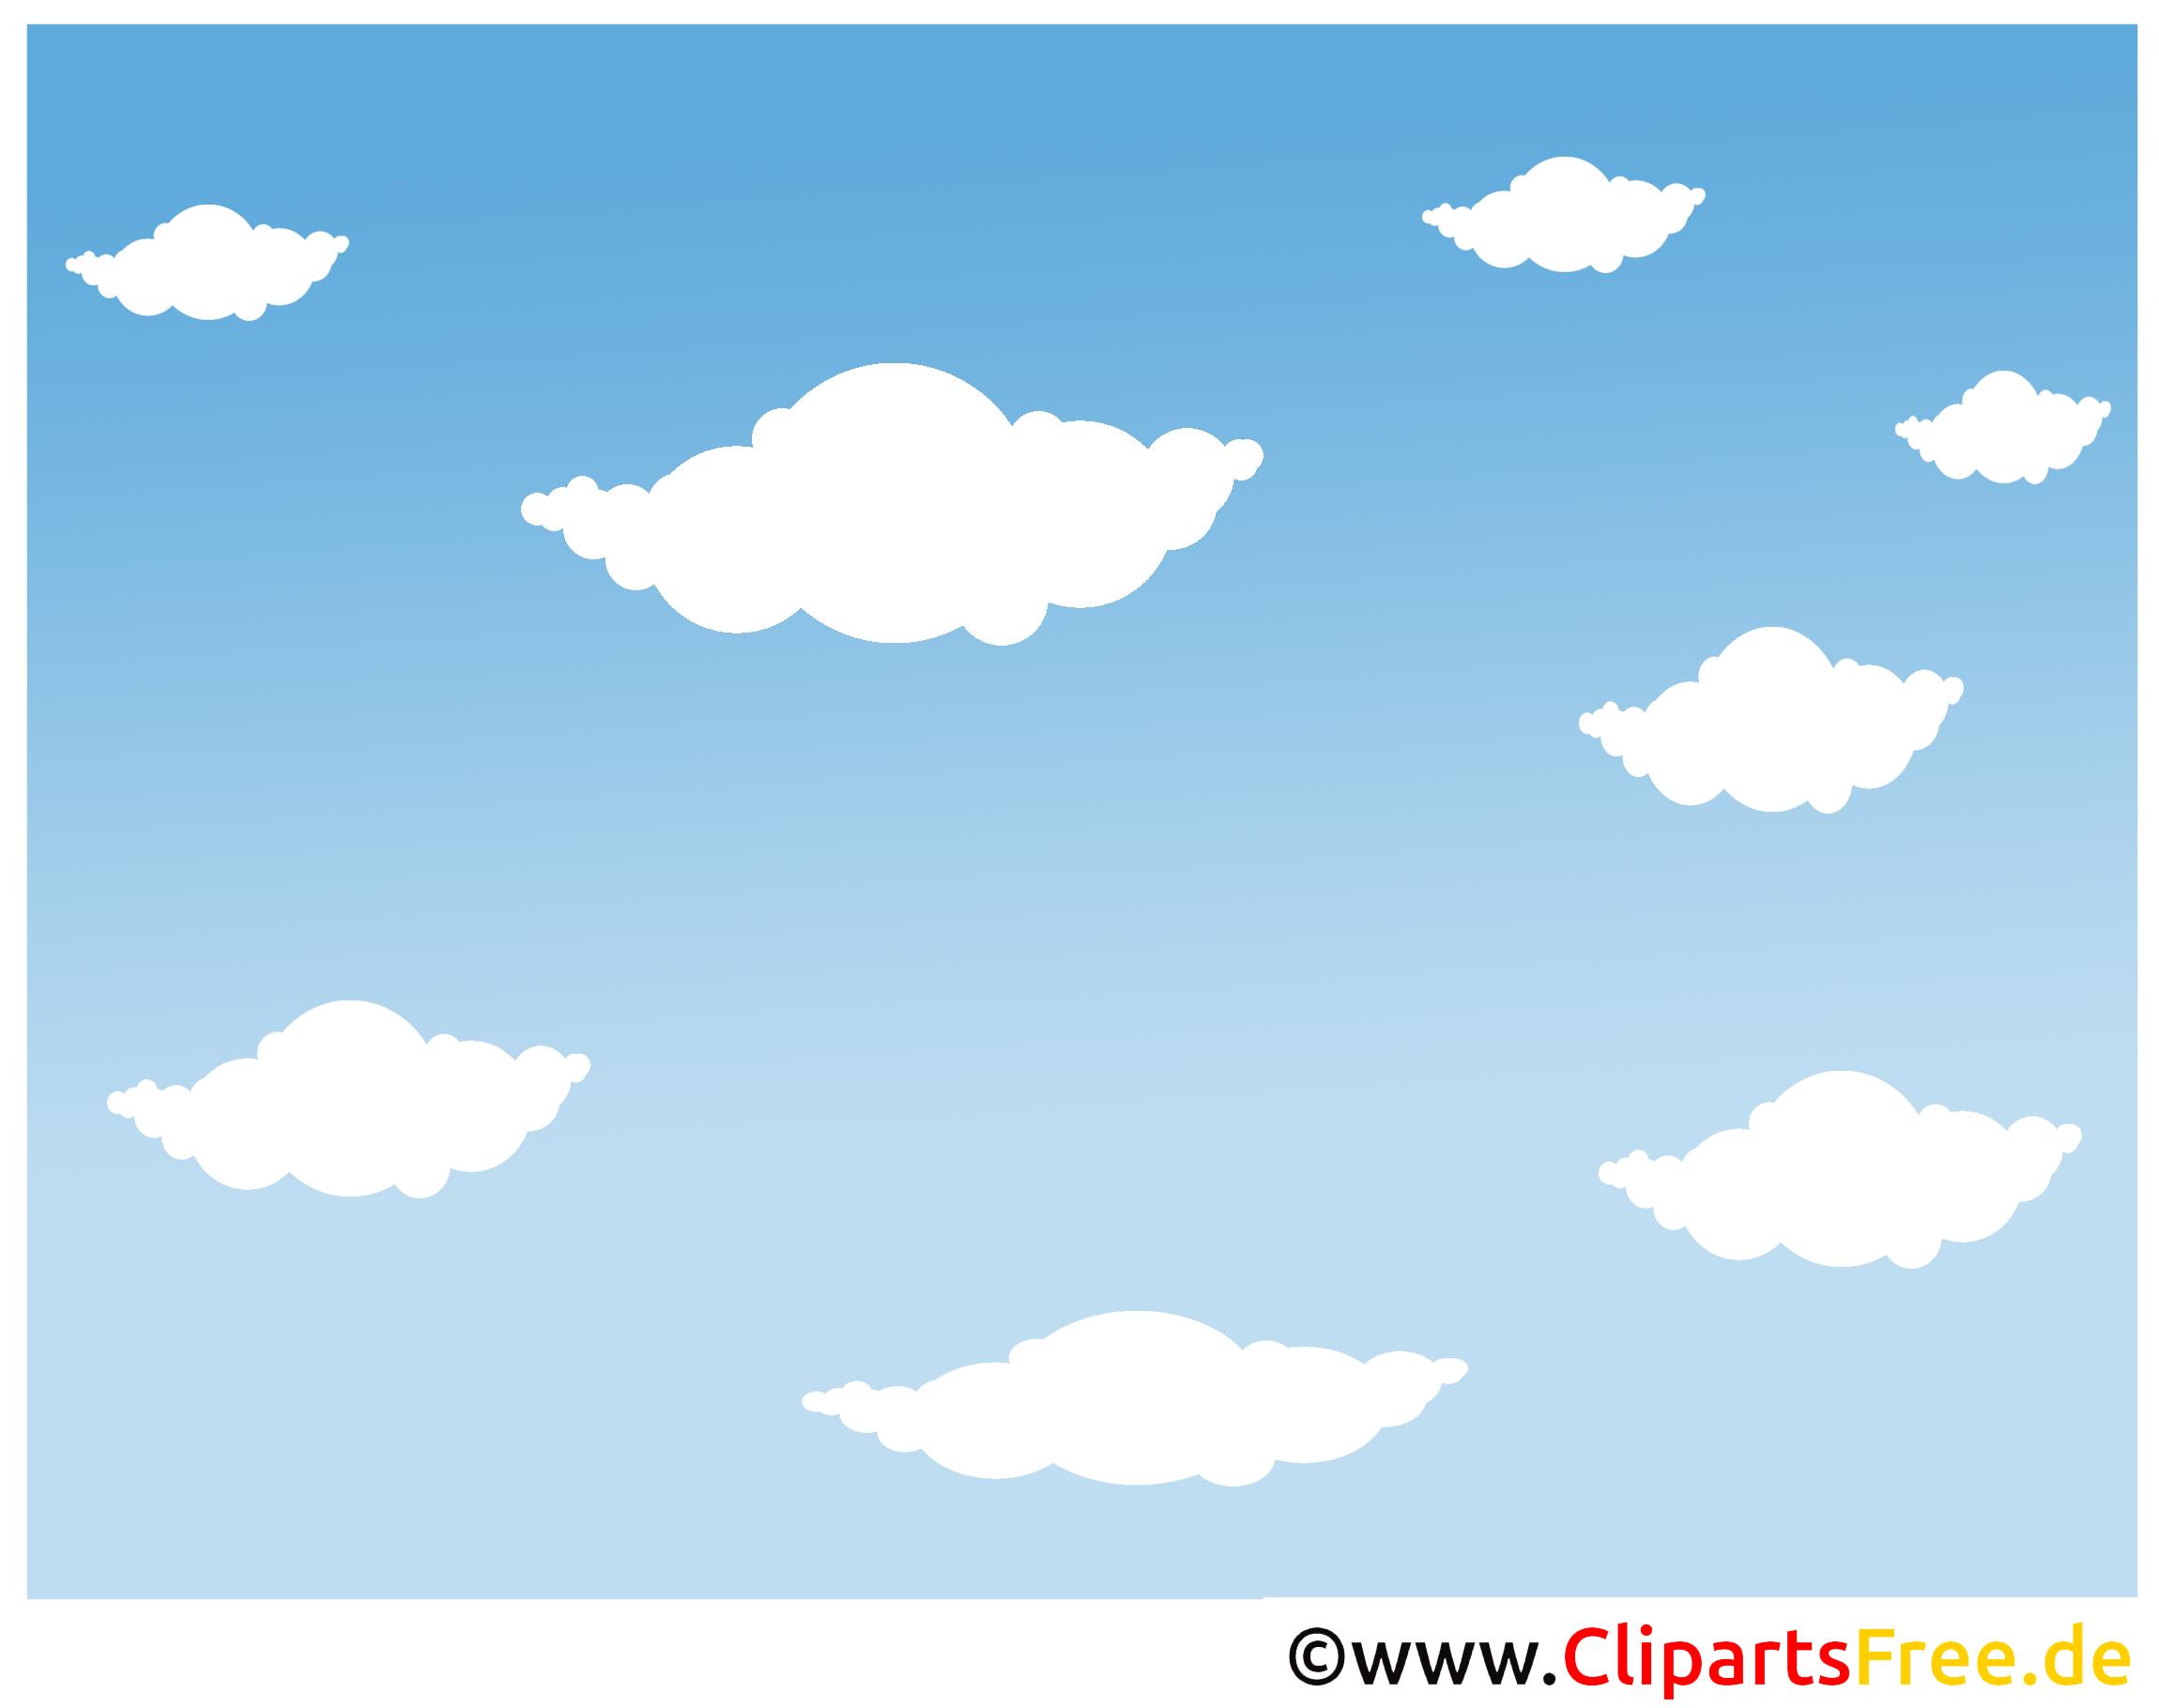 Website achtergrondwolken, blauwe hemel